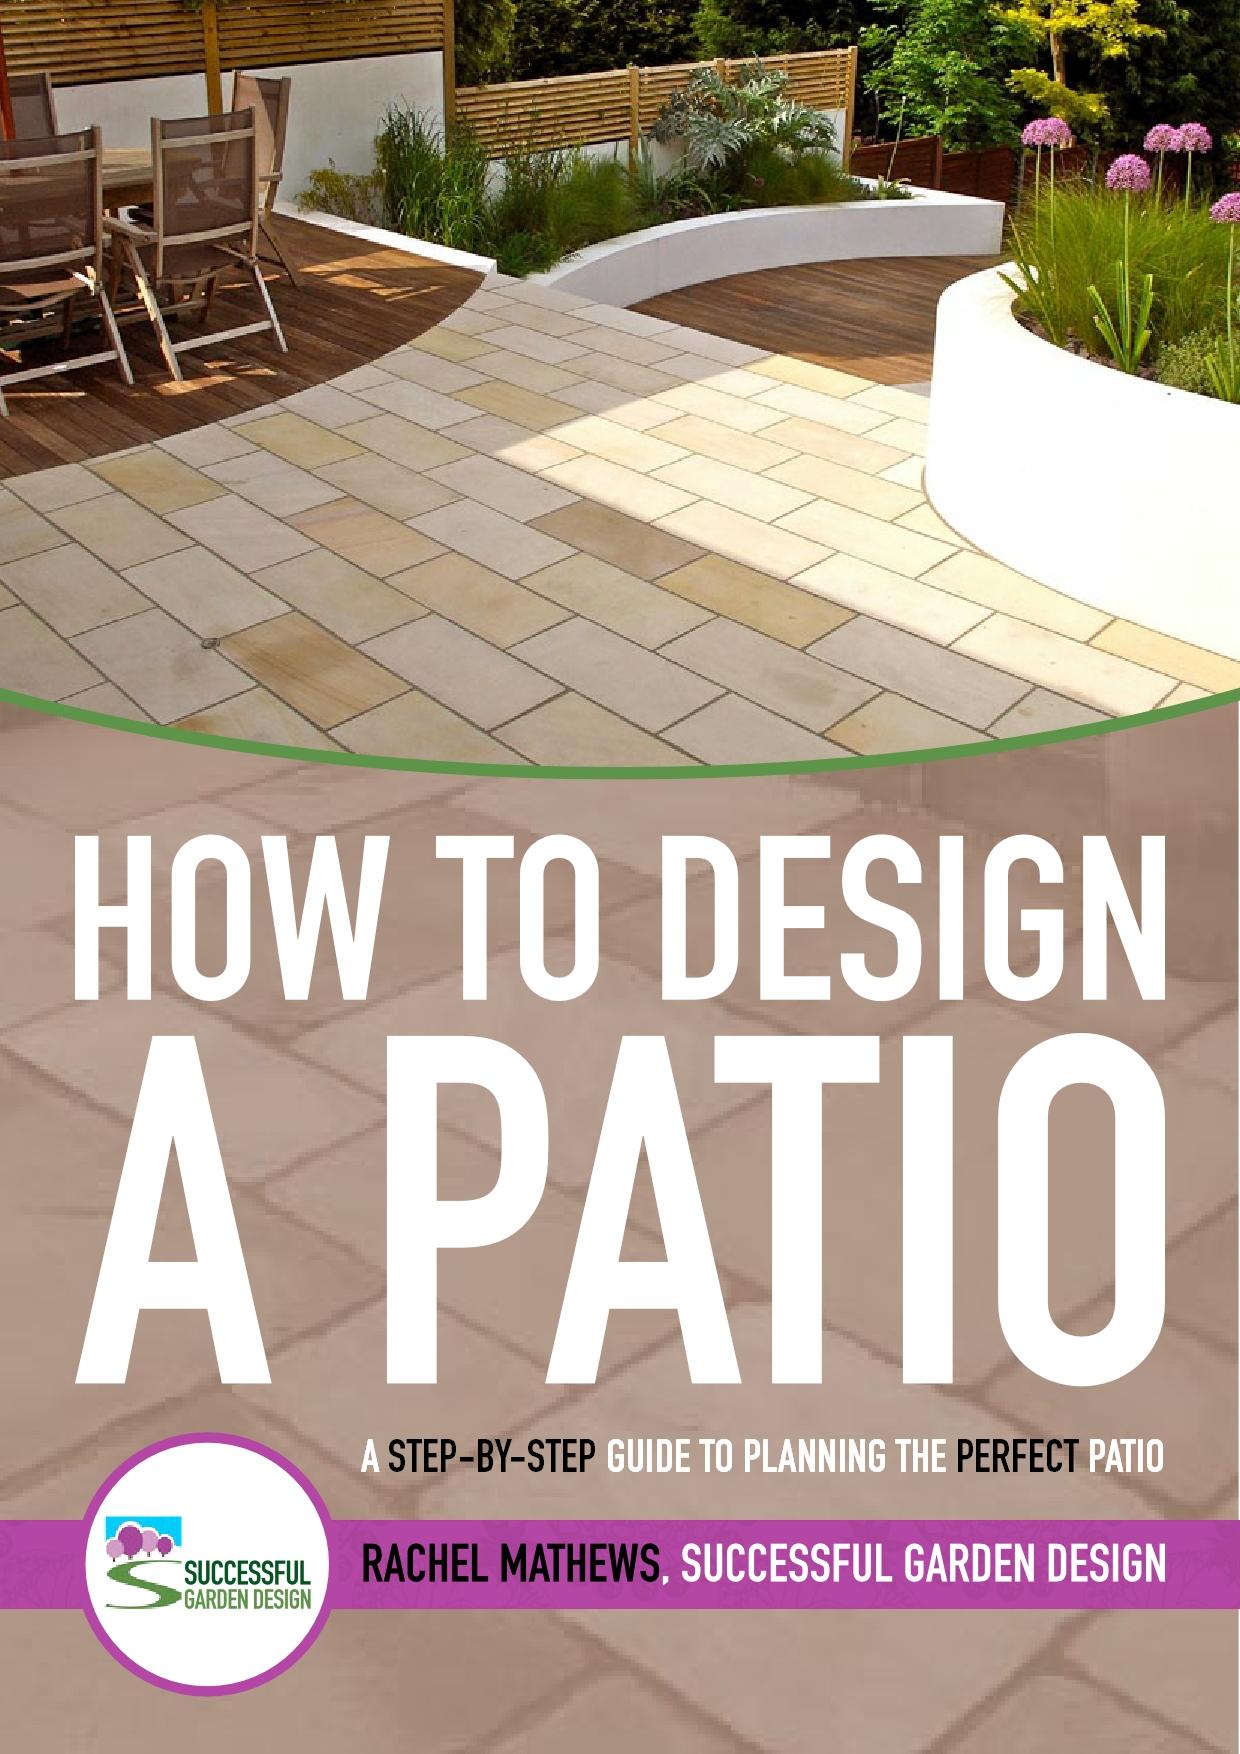 review how to design a patio course